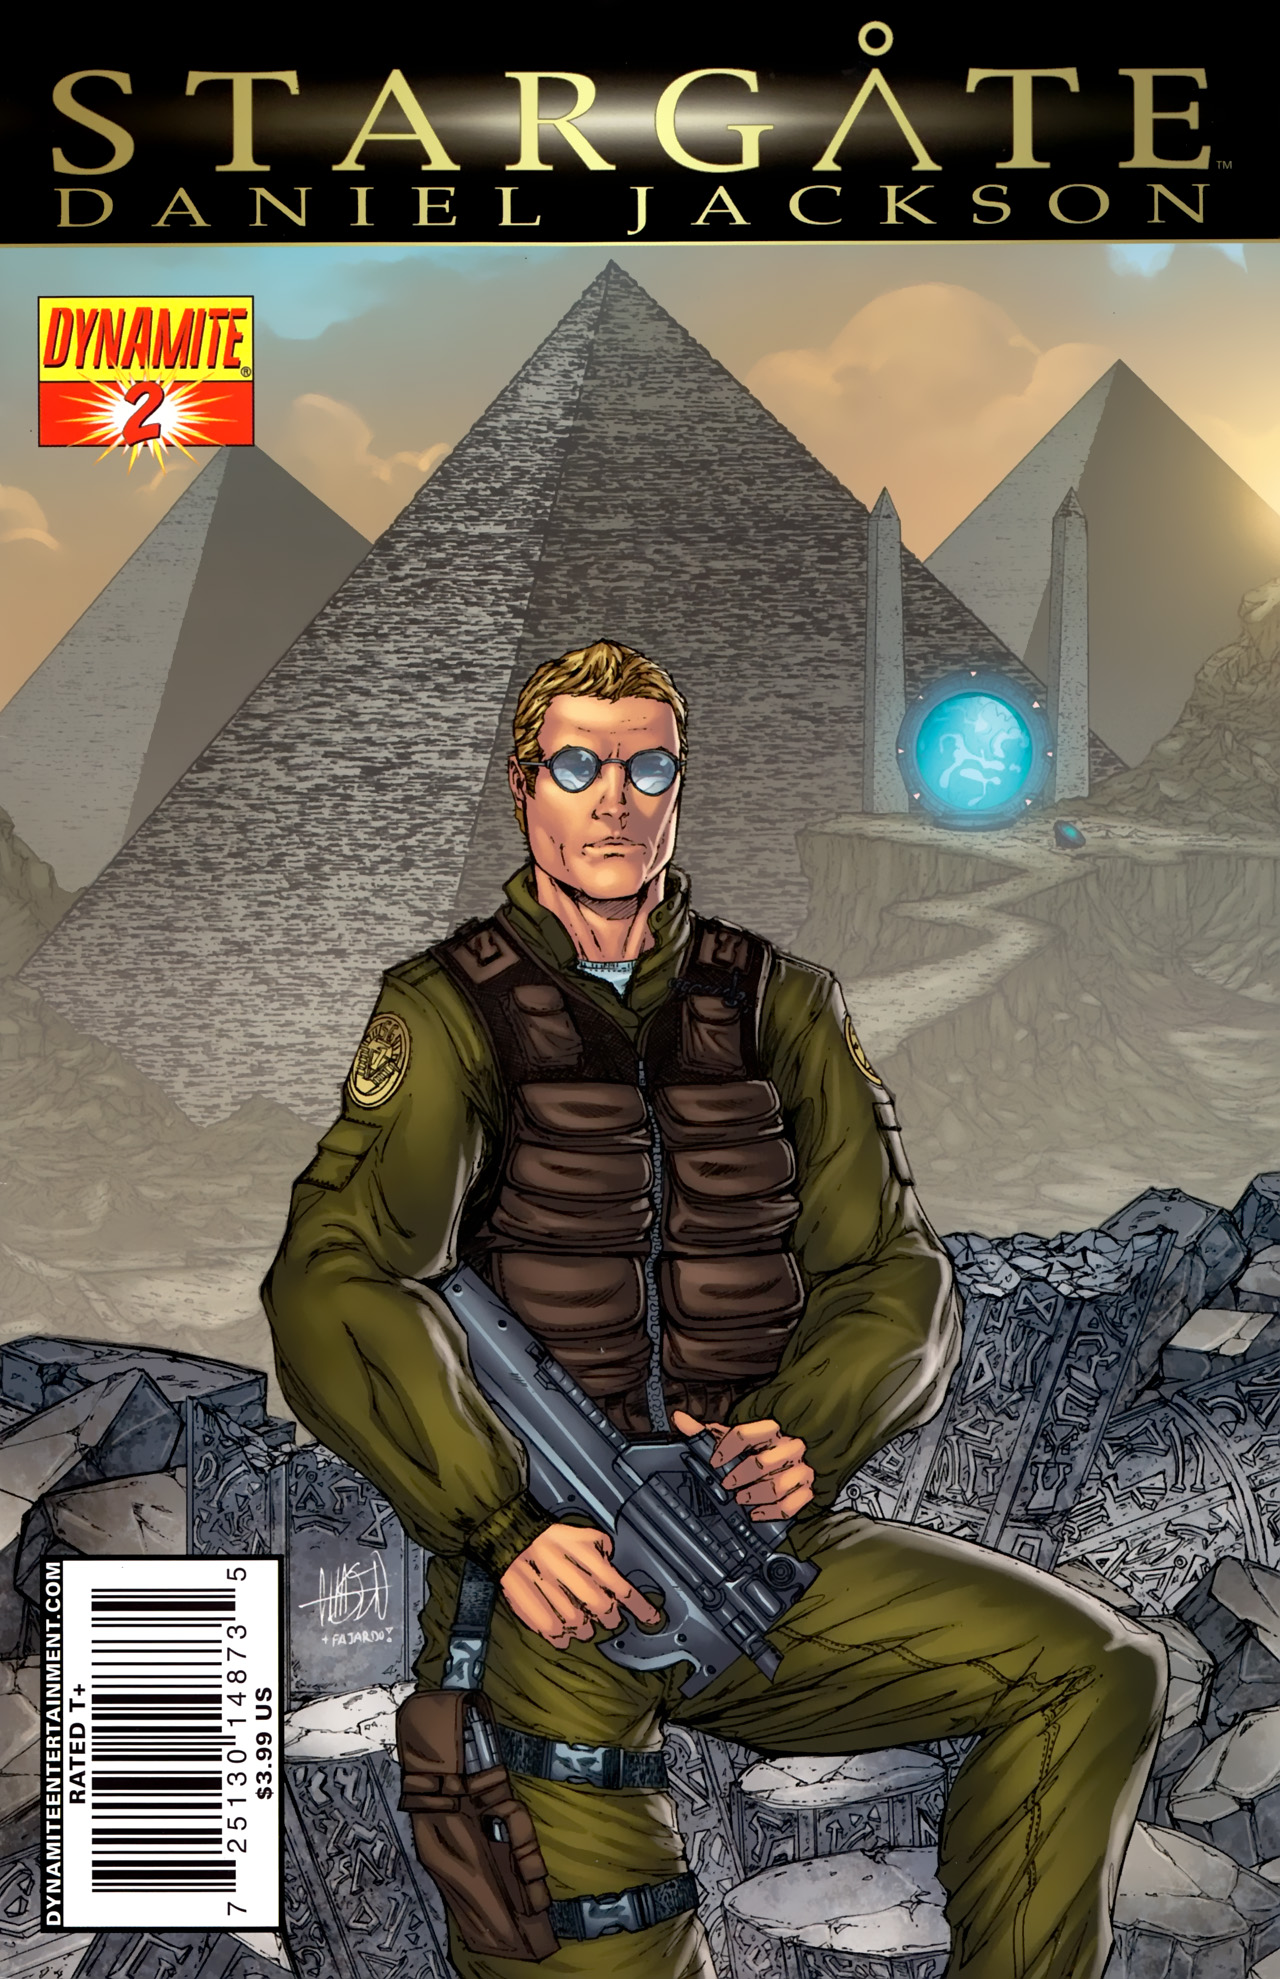 Read online Stargate: Daniel Jackson comic -  Issue #2 - 1